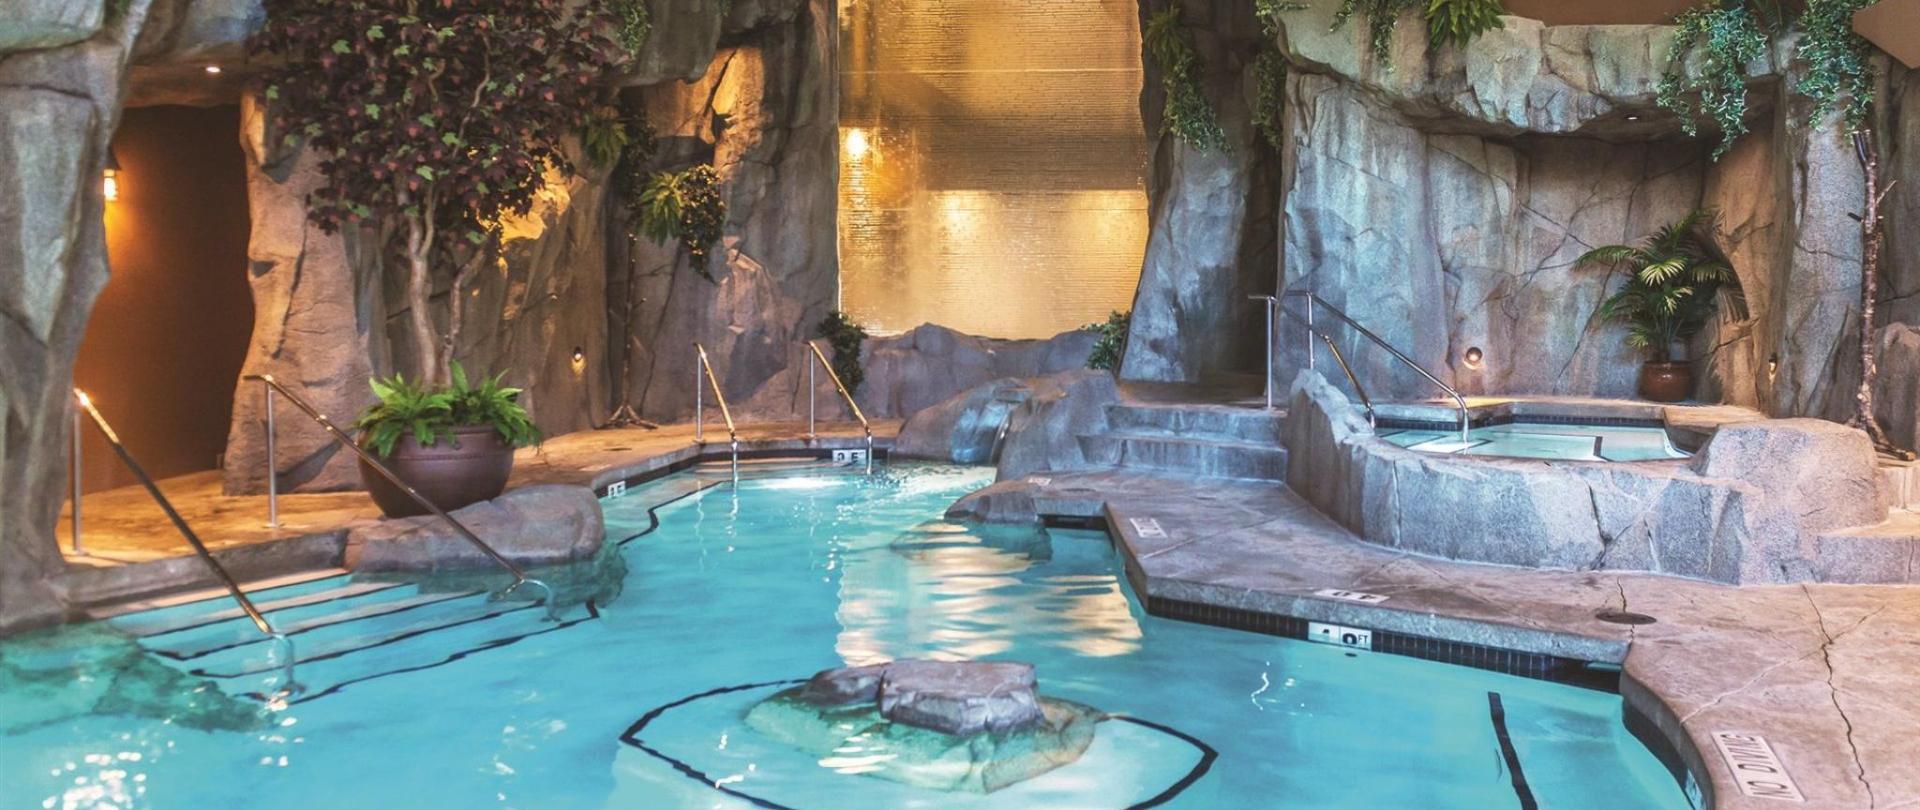 Tigh Na Mara Grotto Spa On Vancouver Island Bc Canada